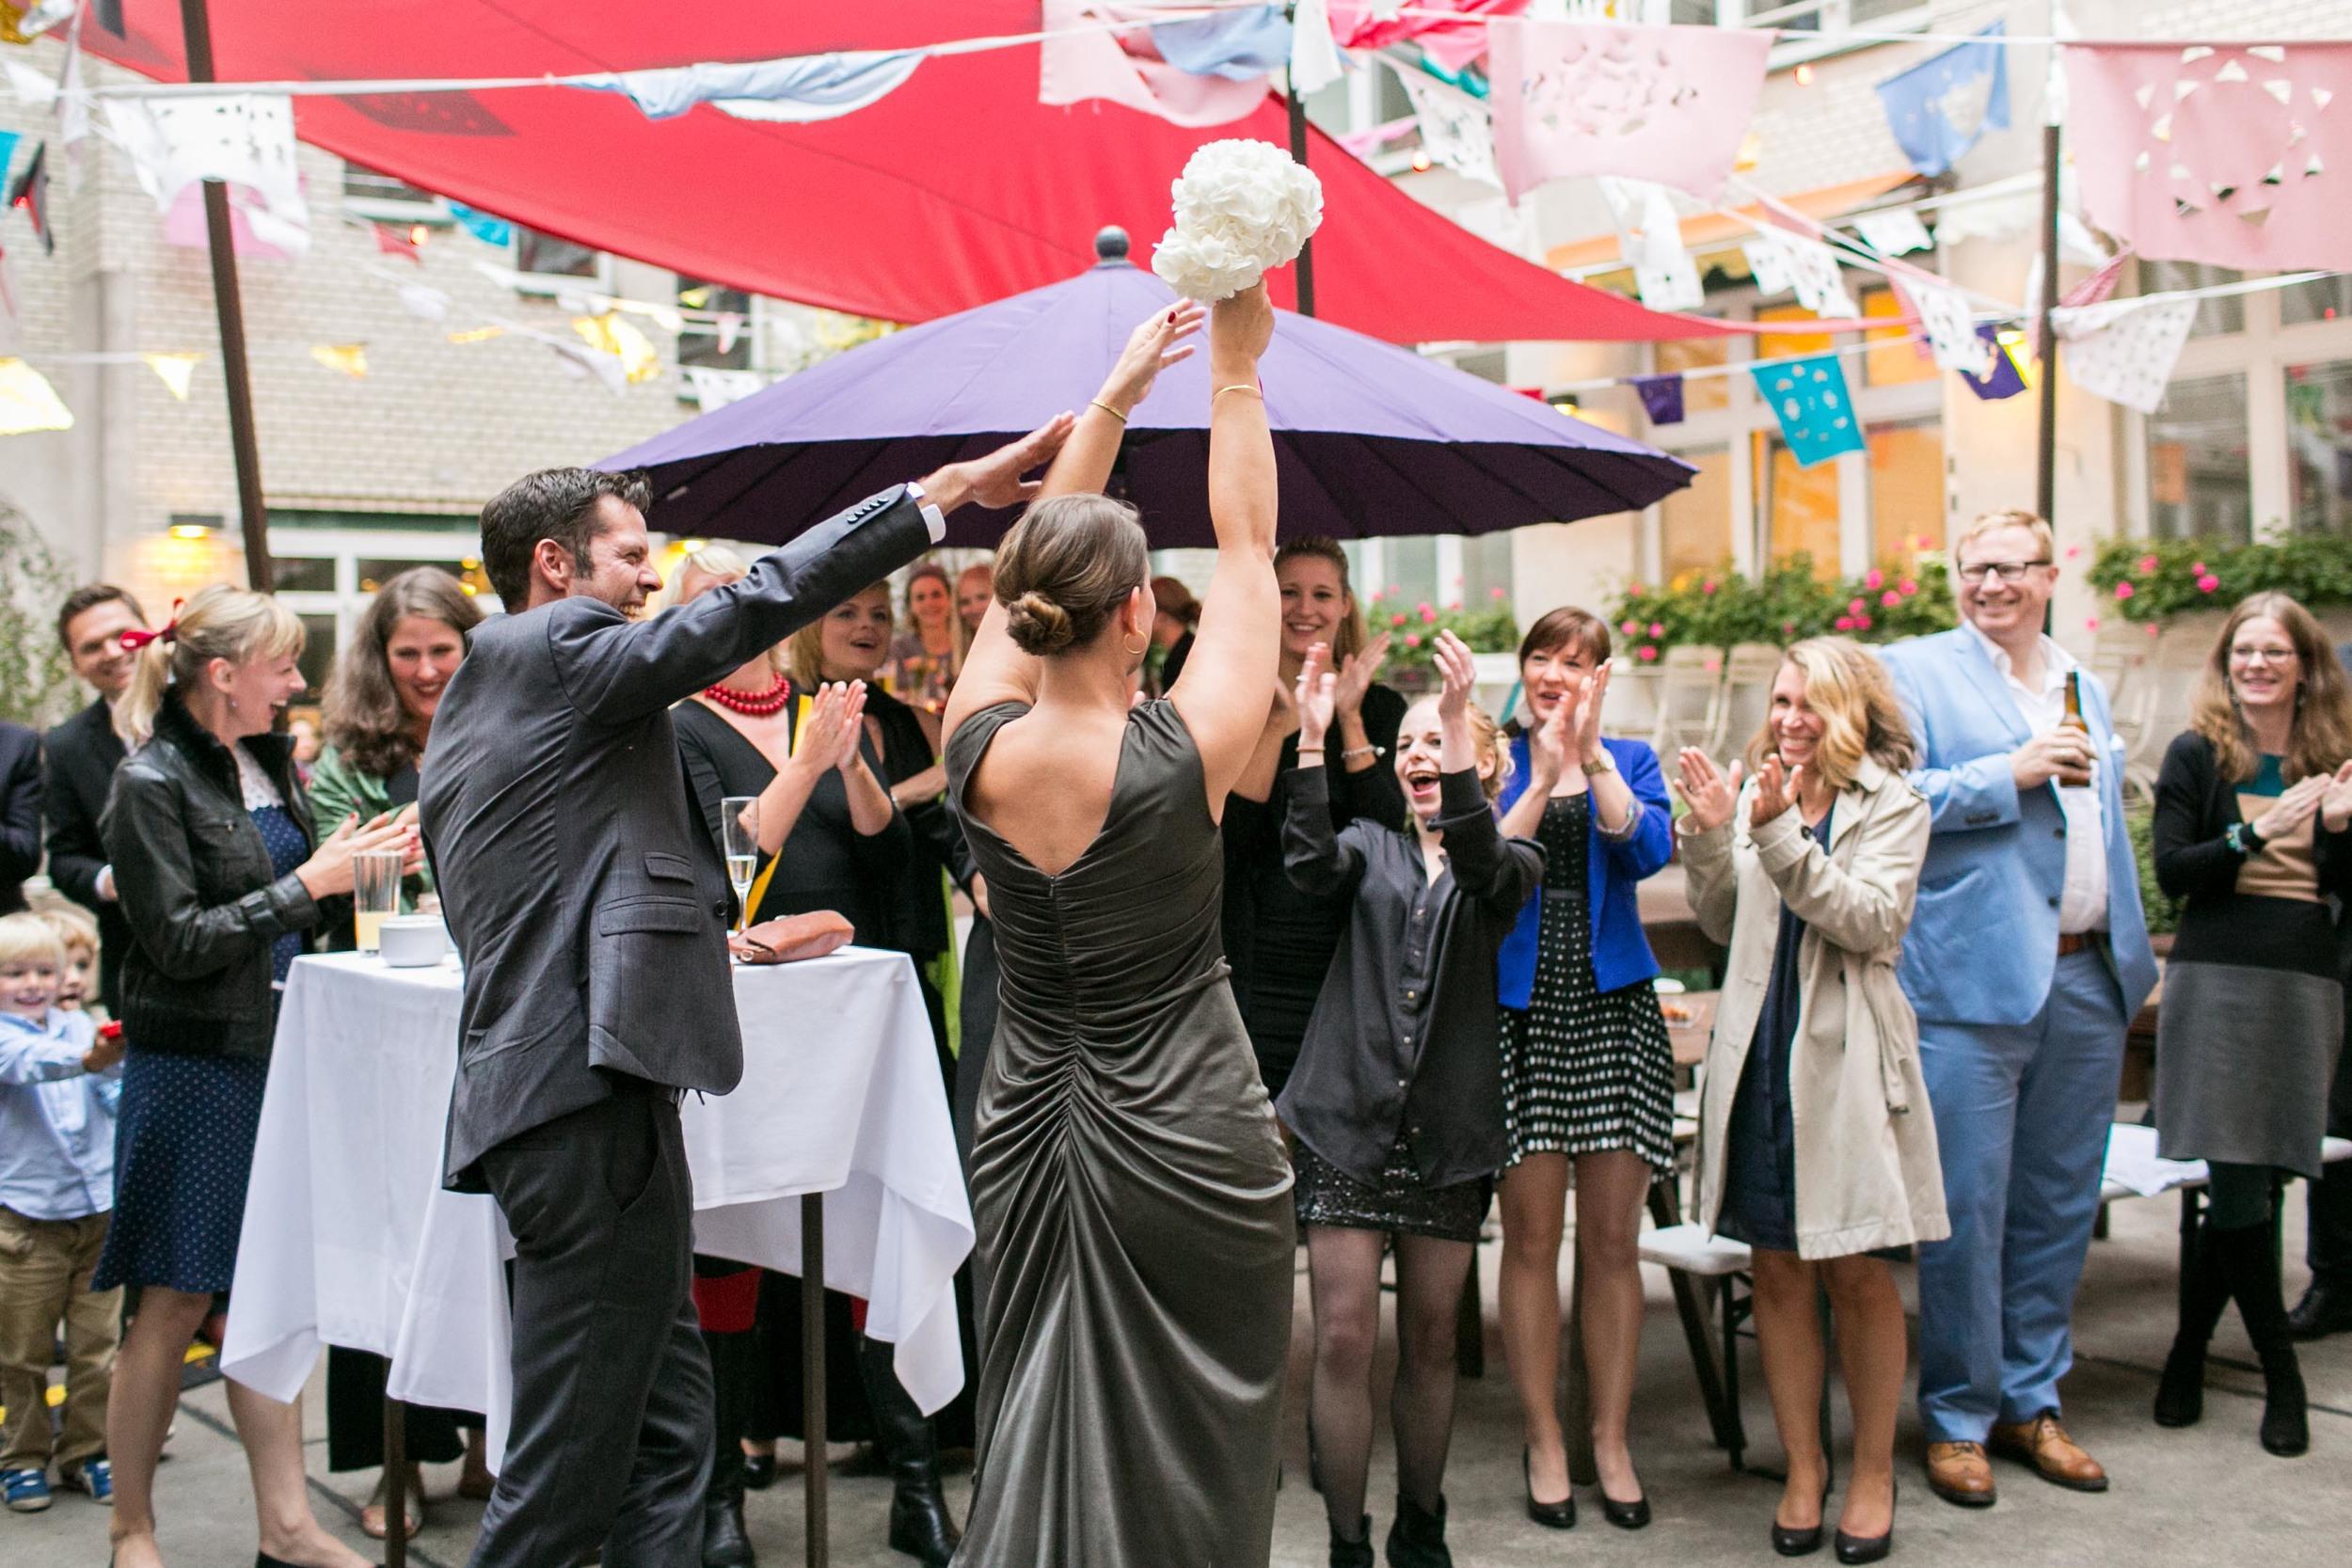 Michelberger Hotel Berlin Hochzeitsfotografie_Fran Burrows Fotografie-99.jpg